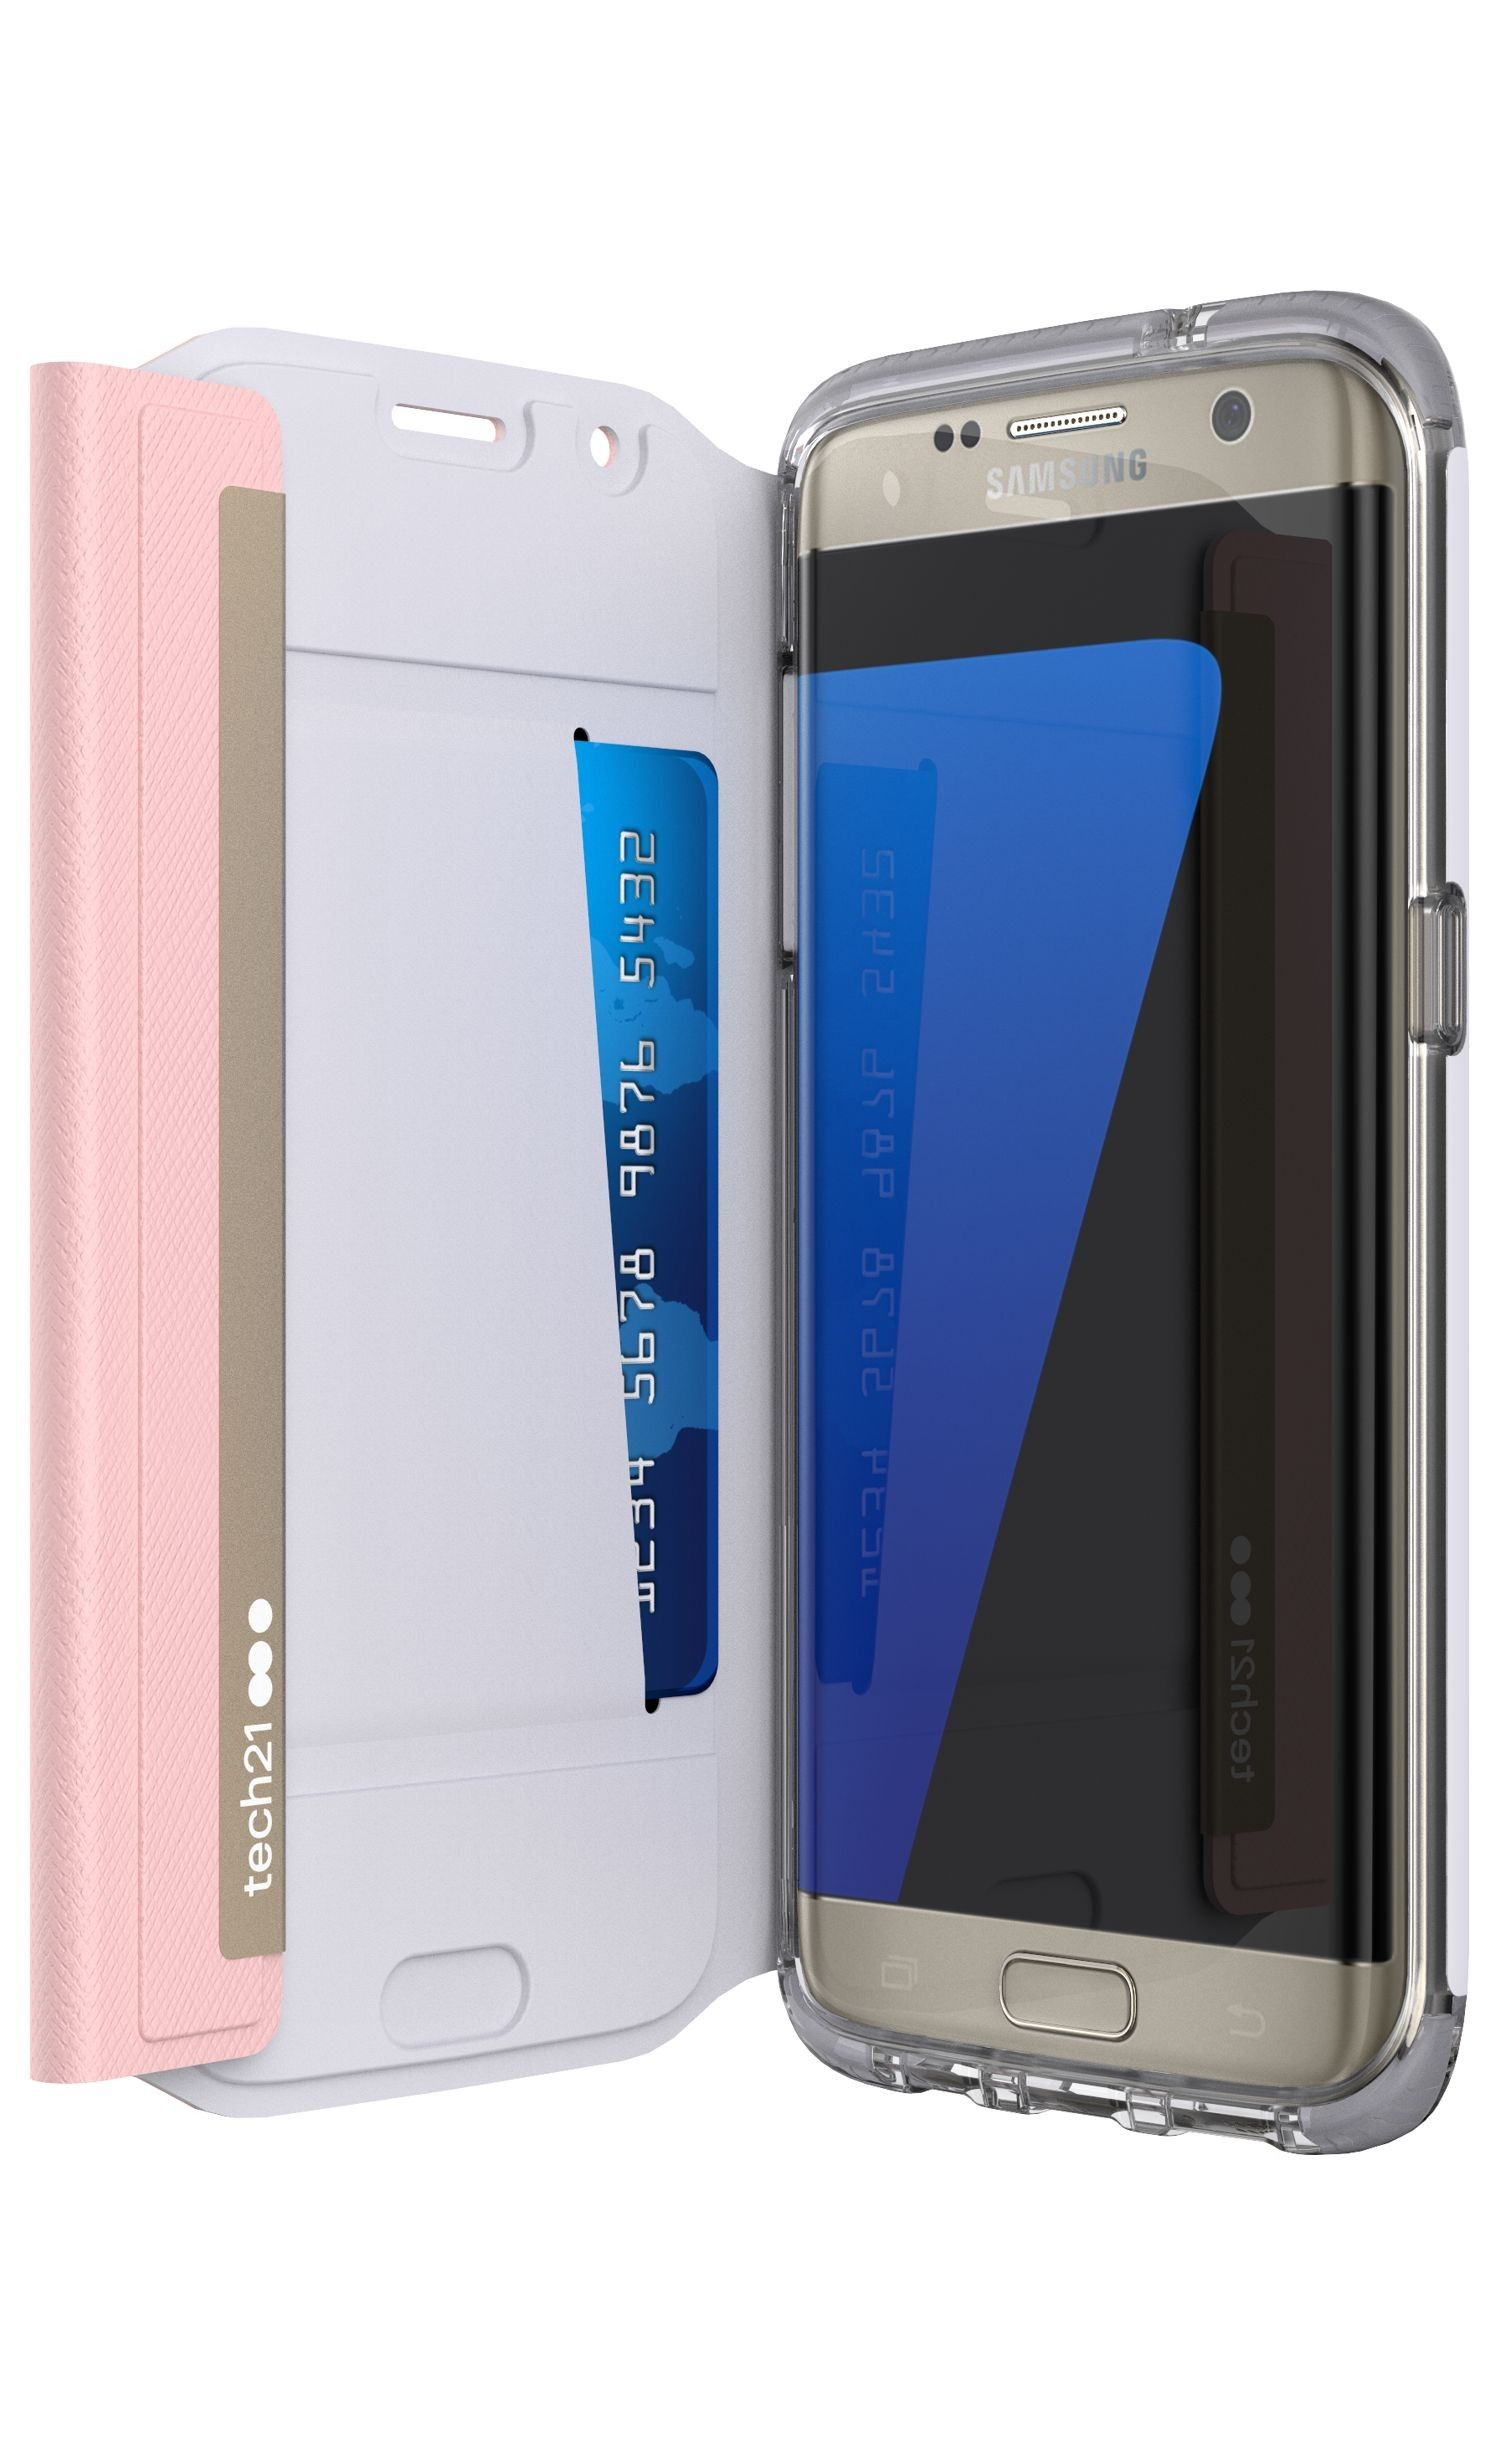 Evo Wallet Case For Samsung Galaxy S7 Edge Galaxy S7 Edge Cases Samsung Smartphone Prote Samsung Galaxy S7 Edge Samsung Galaxy S7 Cases Samsung Galaxy S7